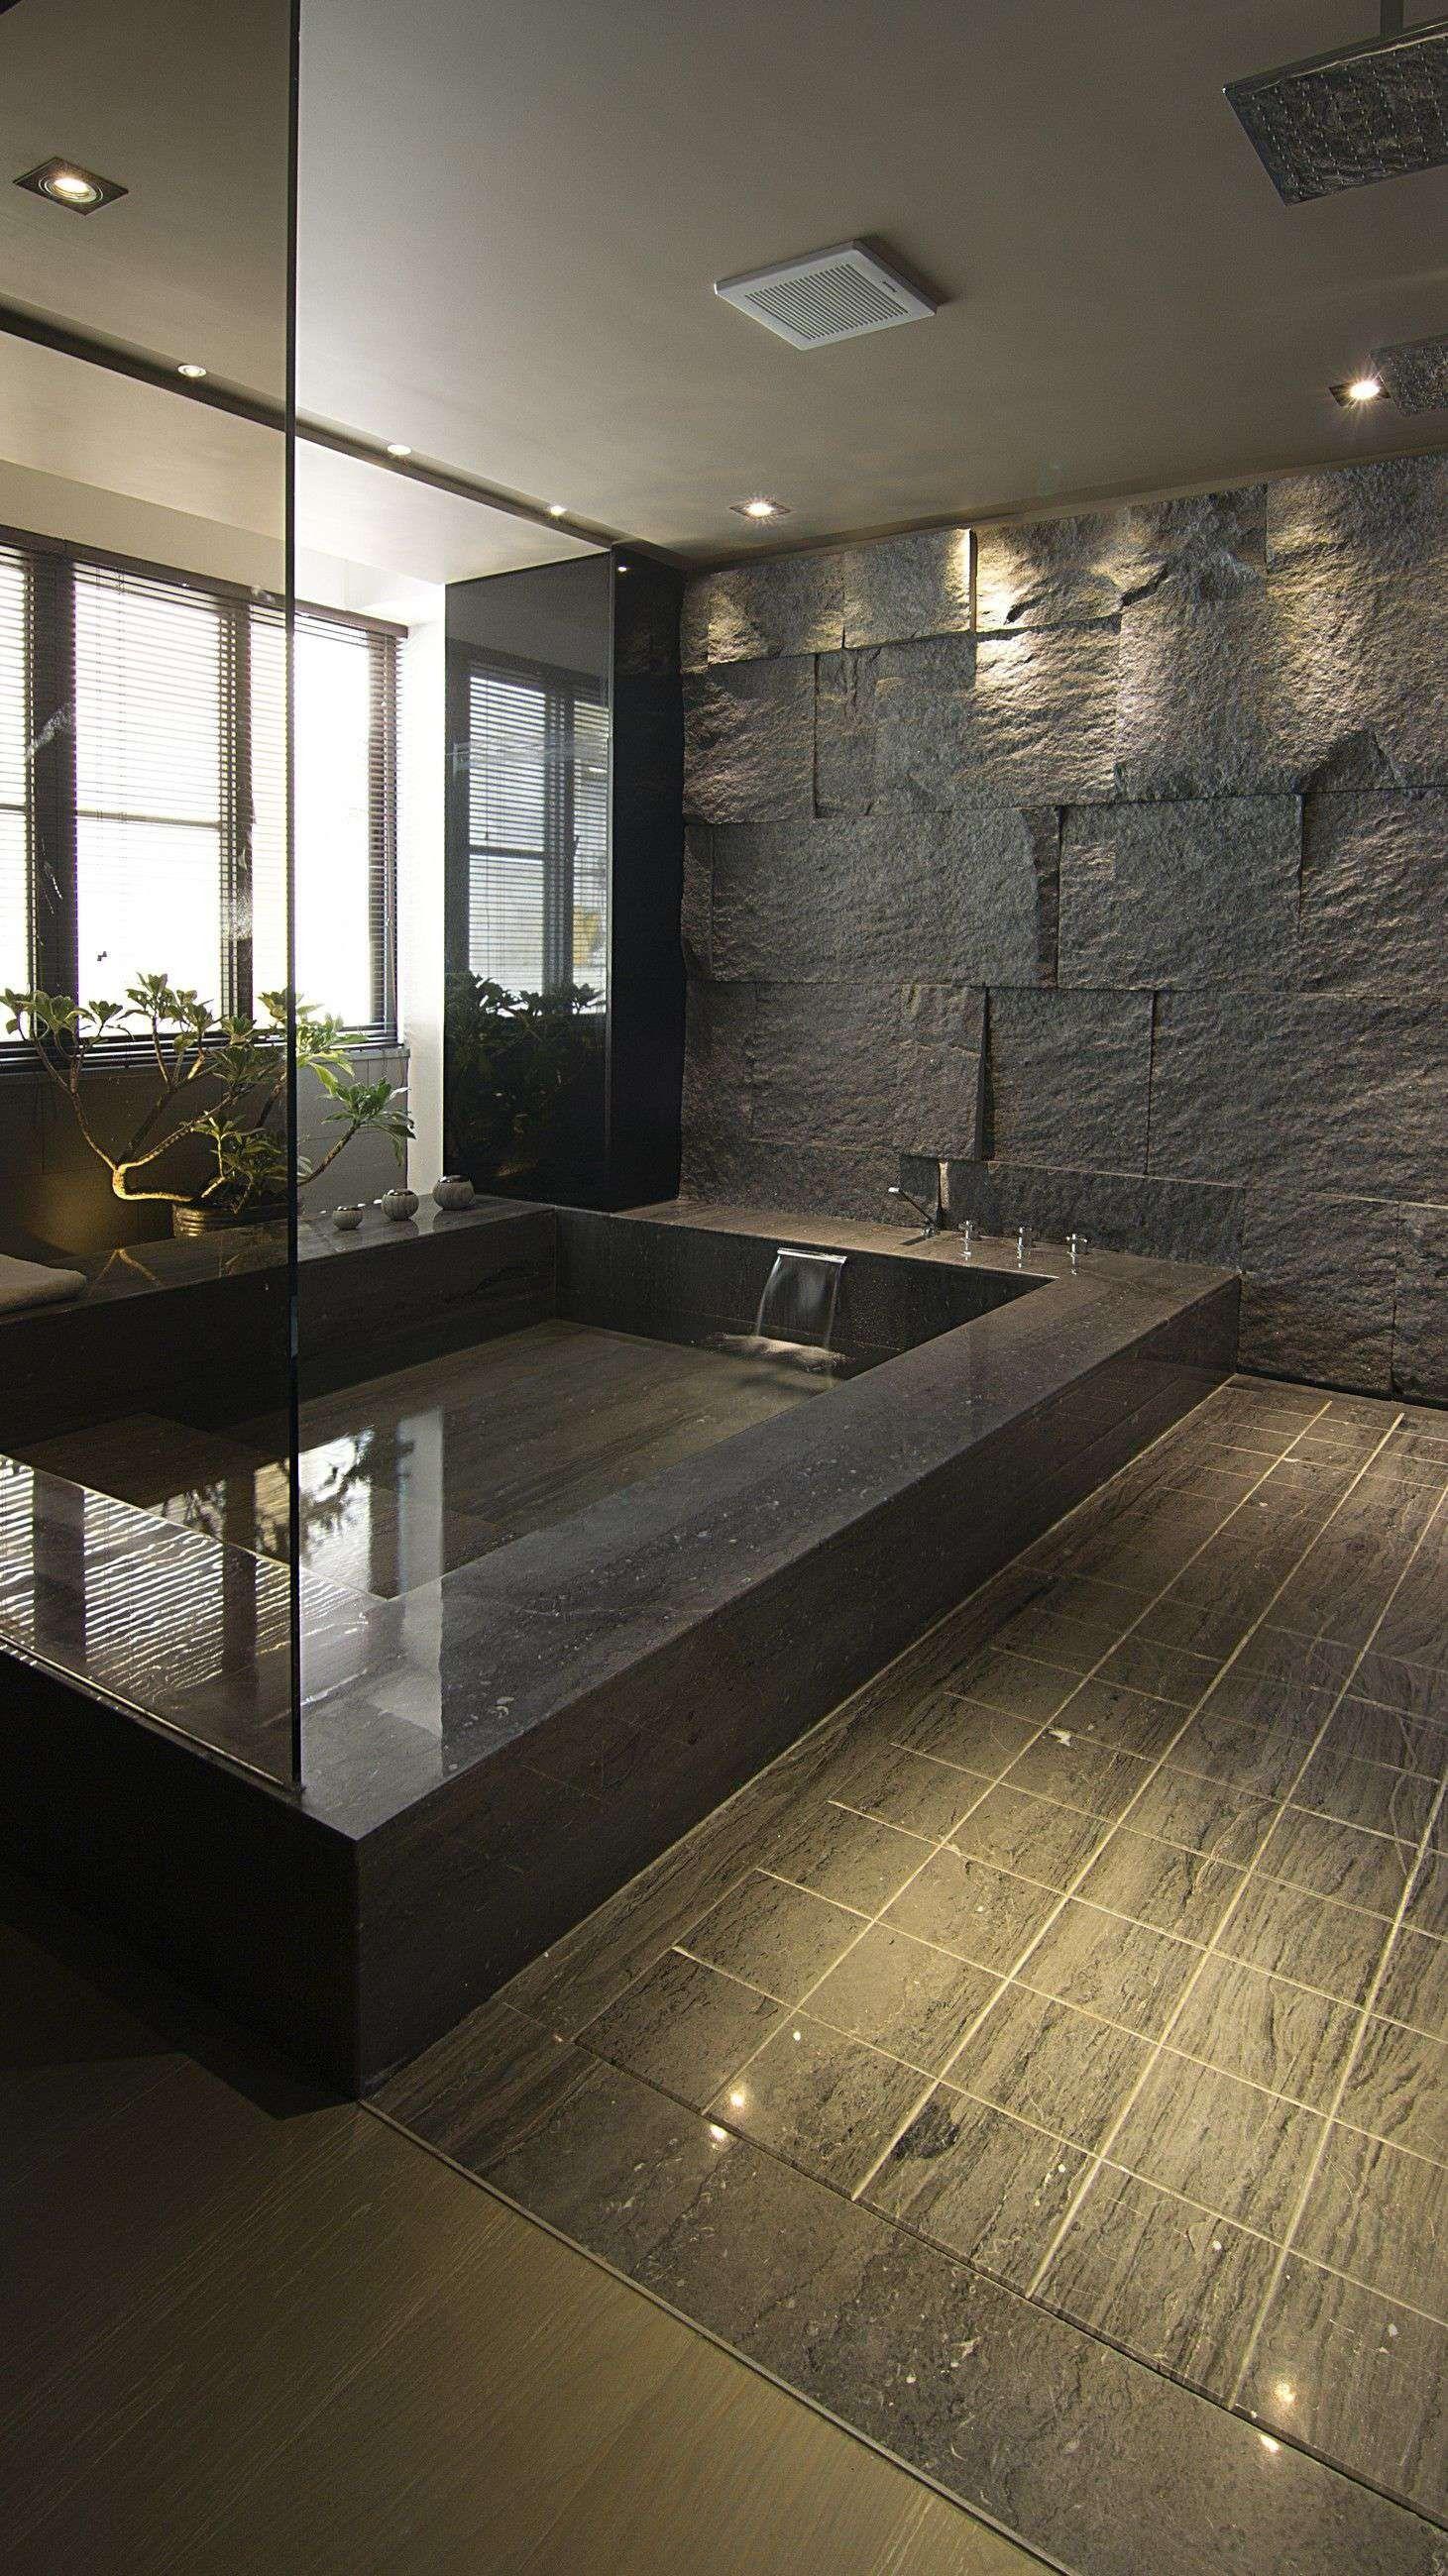 33 Wondrous Japanese Bathroom Ideas #dreambathrooms